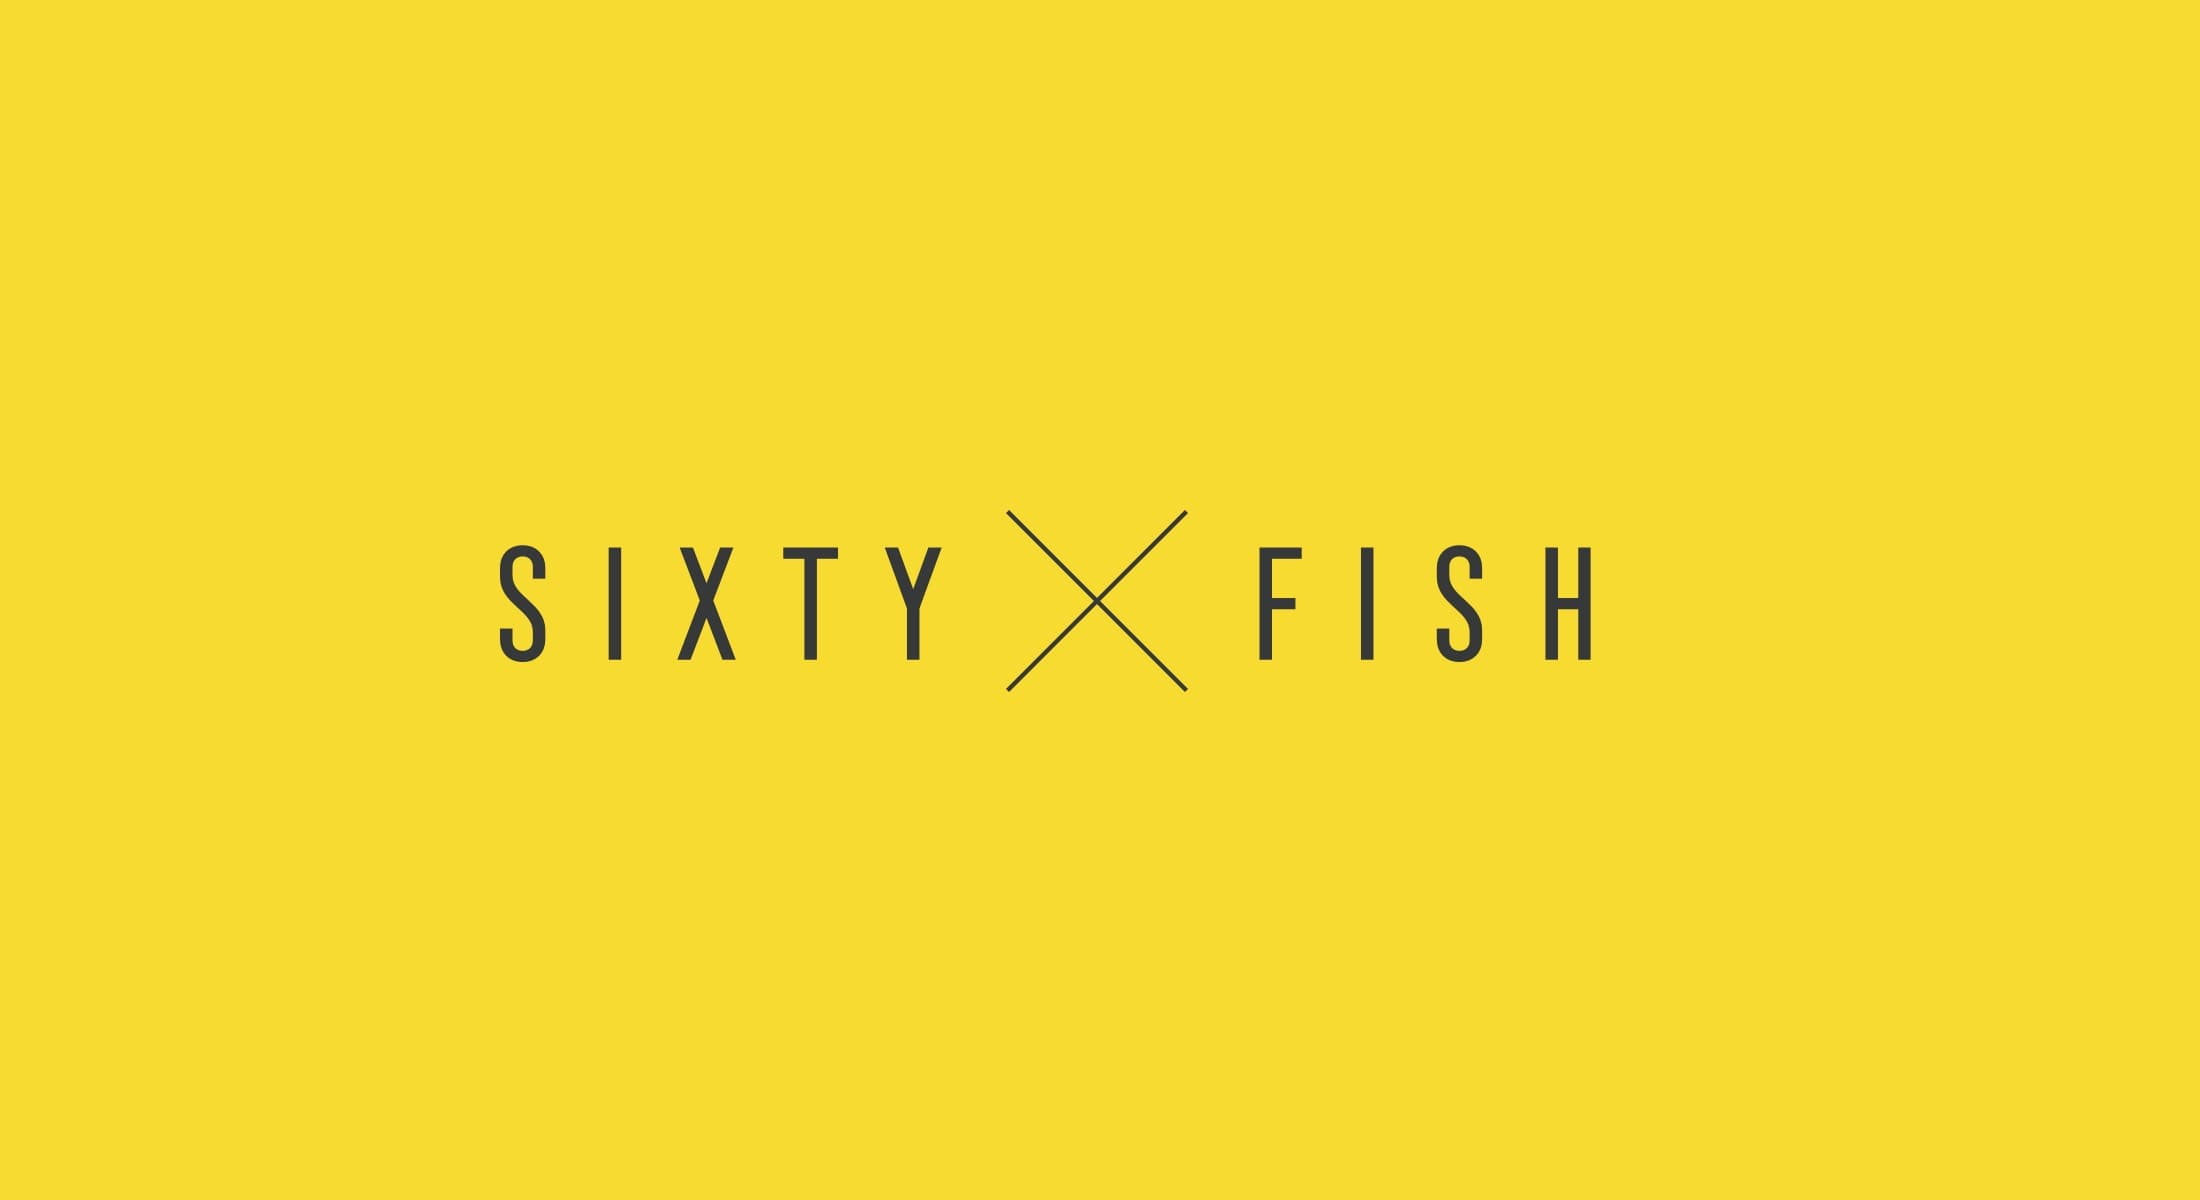 Sixty Fish